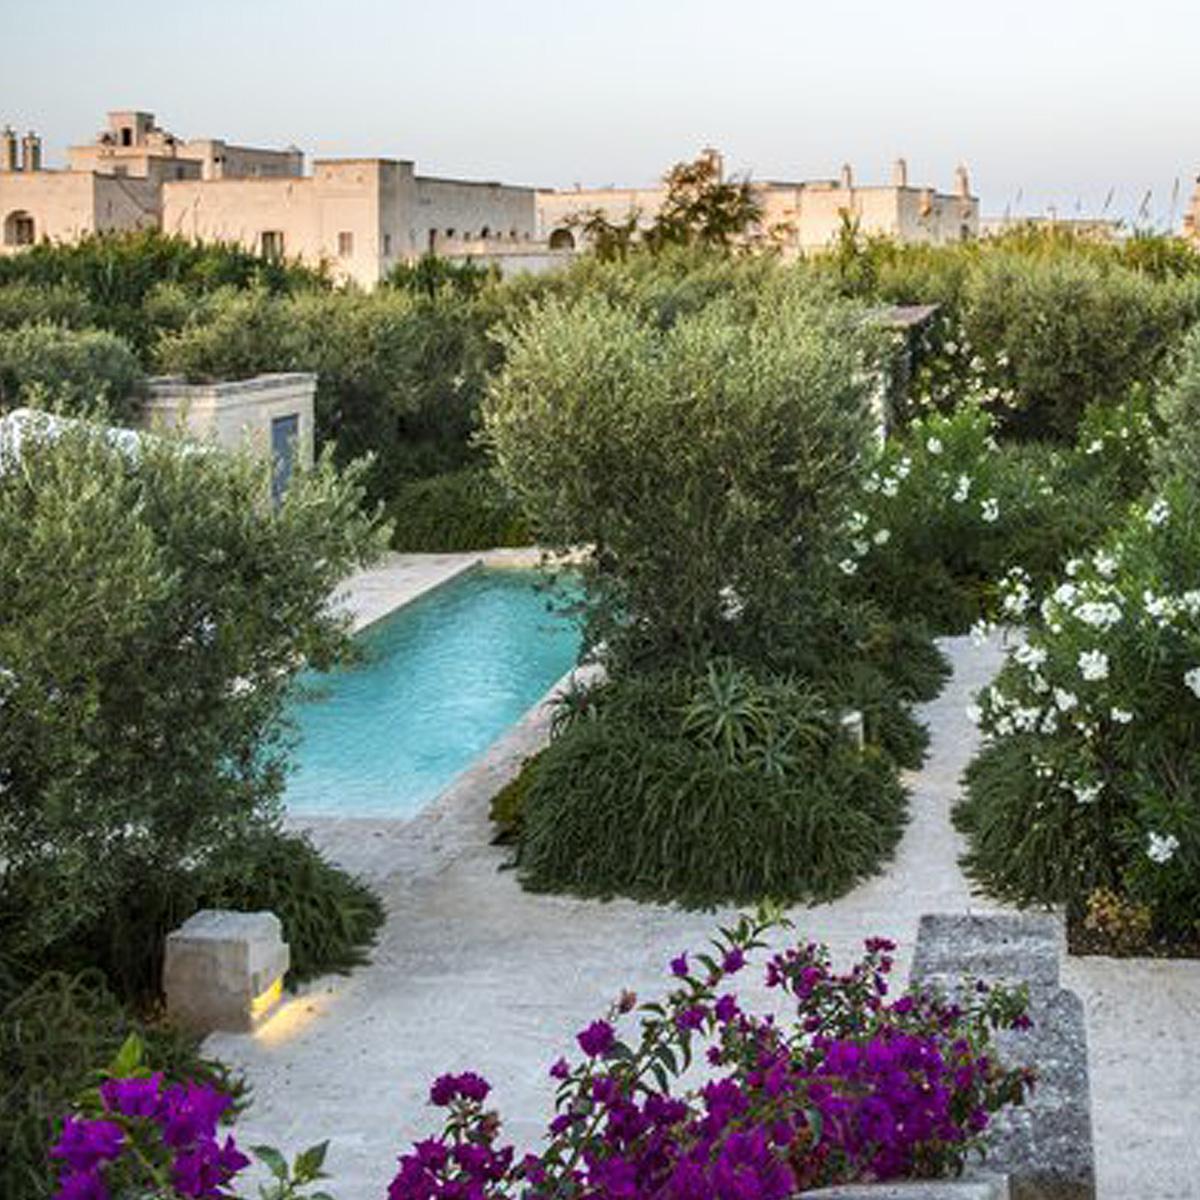 Borgo Egnazia (25)